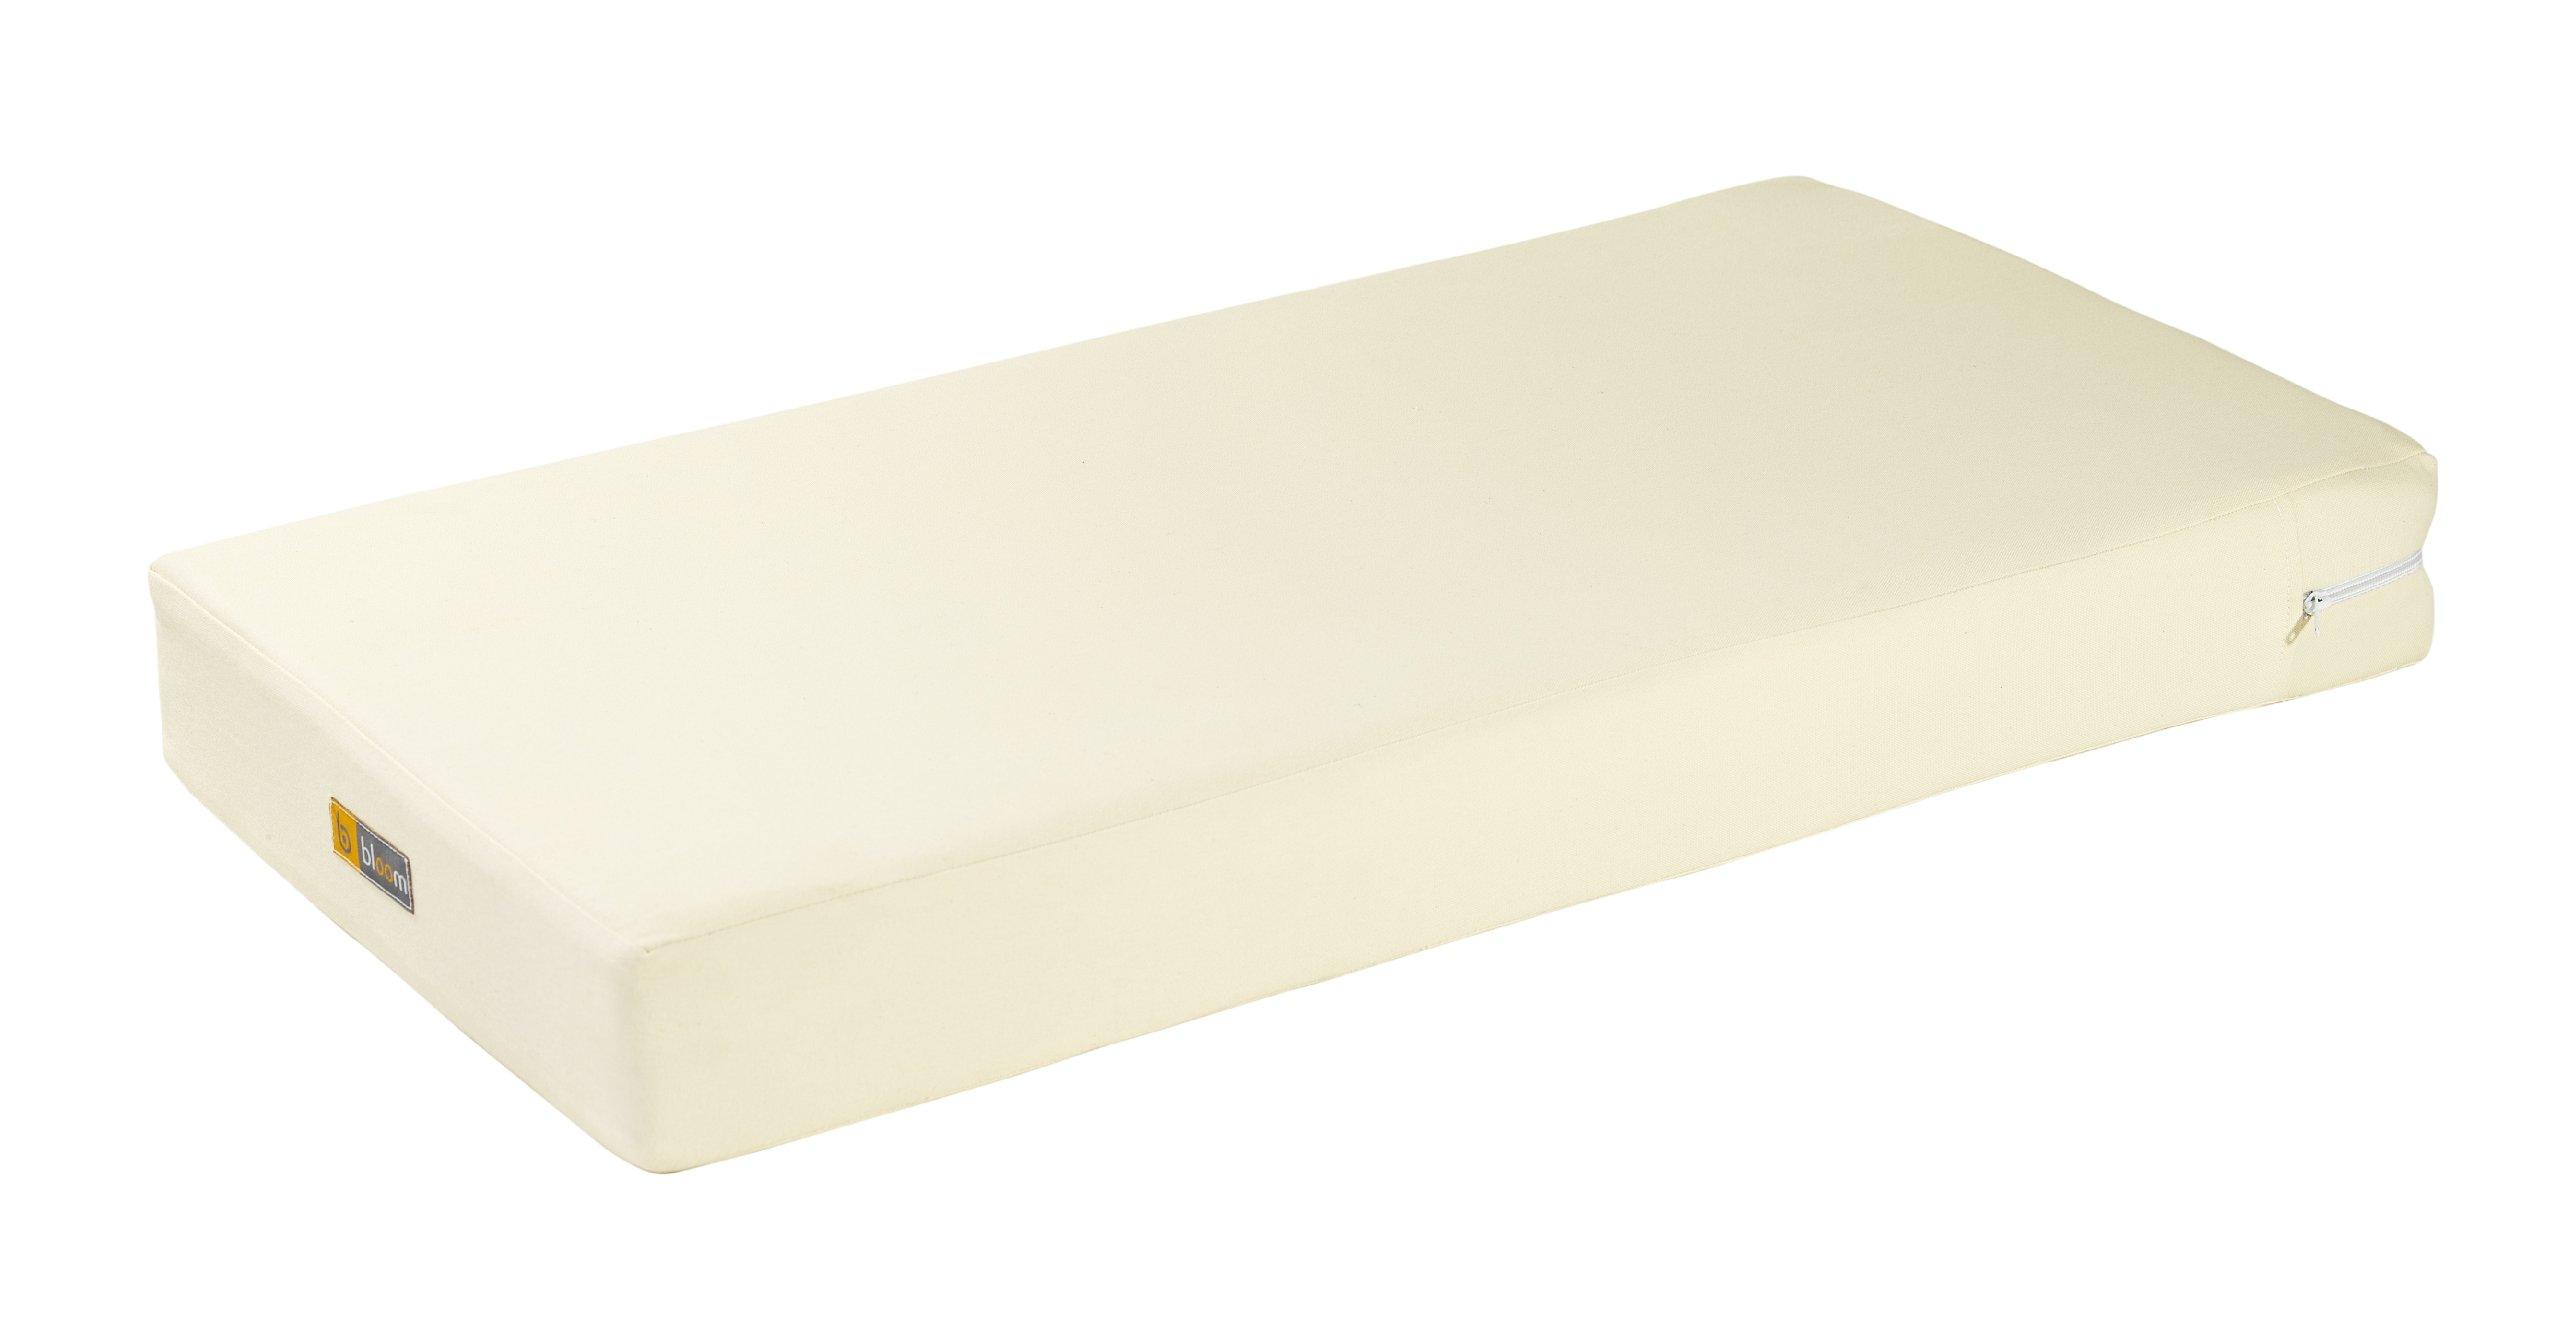 Bloom US standard crib alma max & retro spring mattress